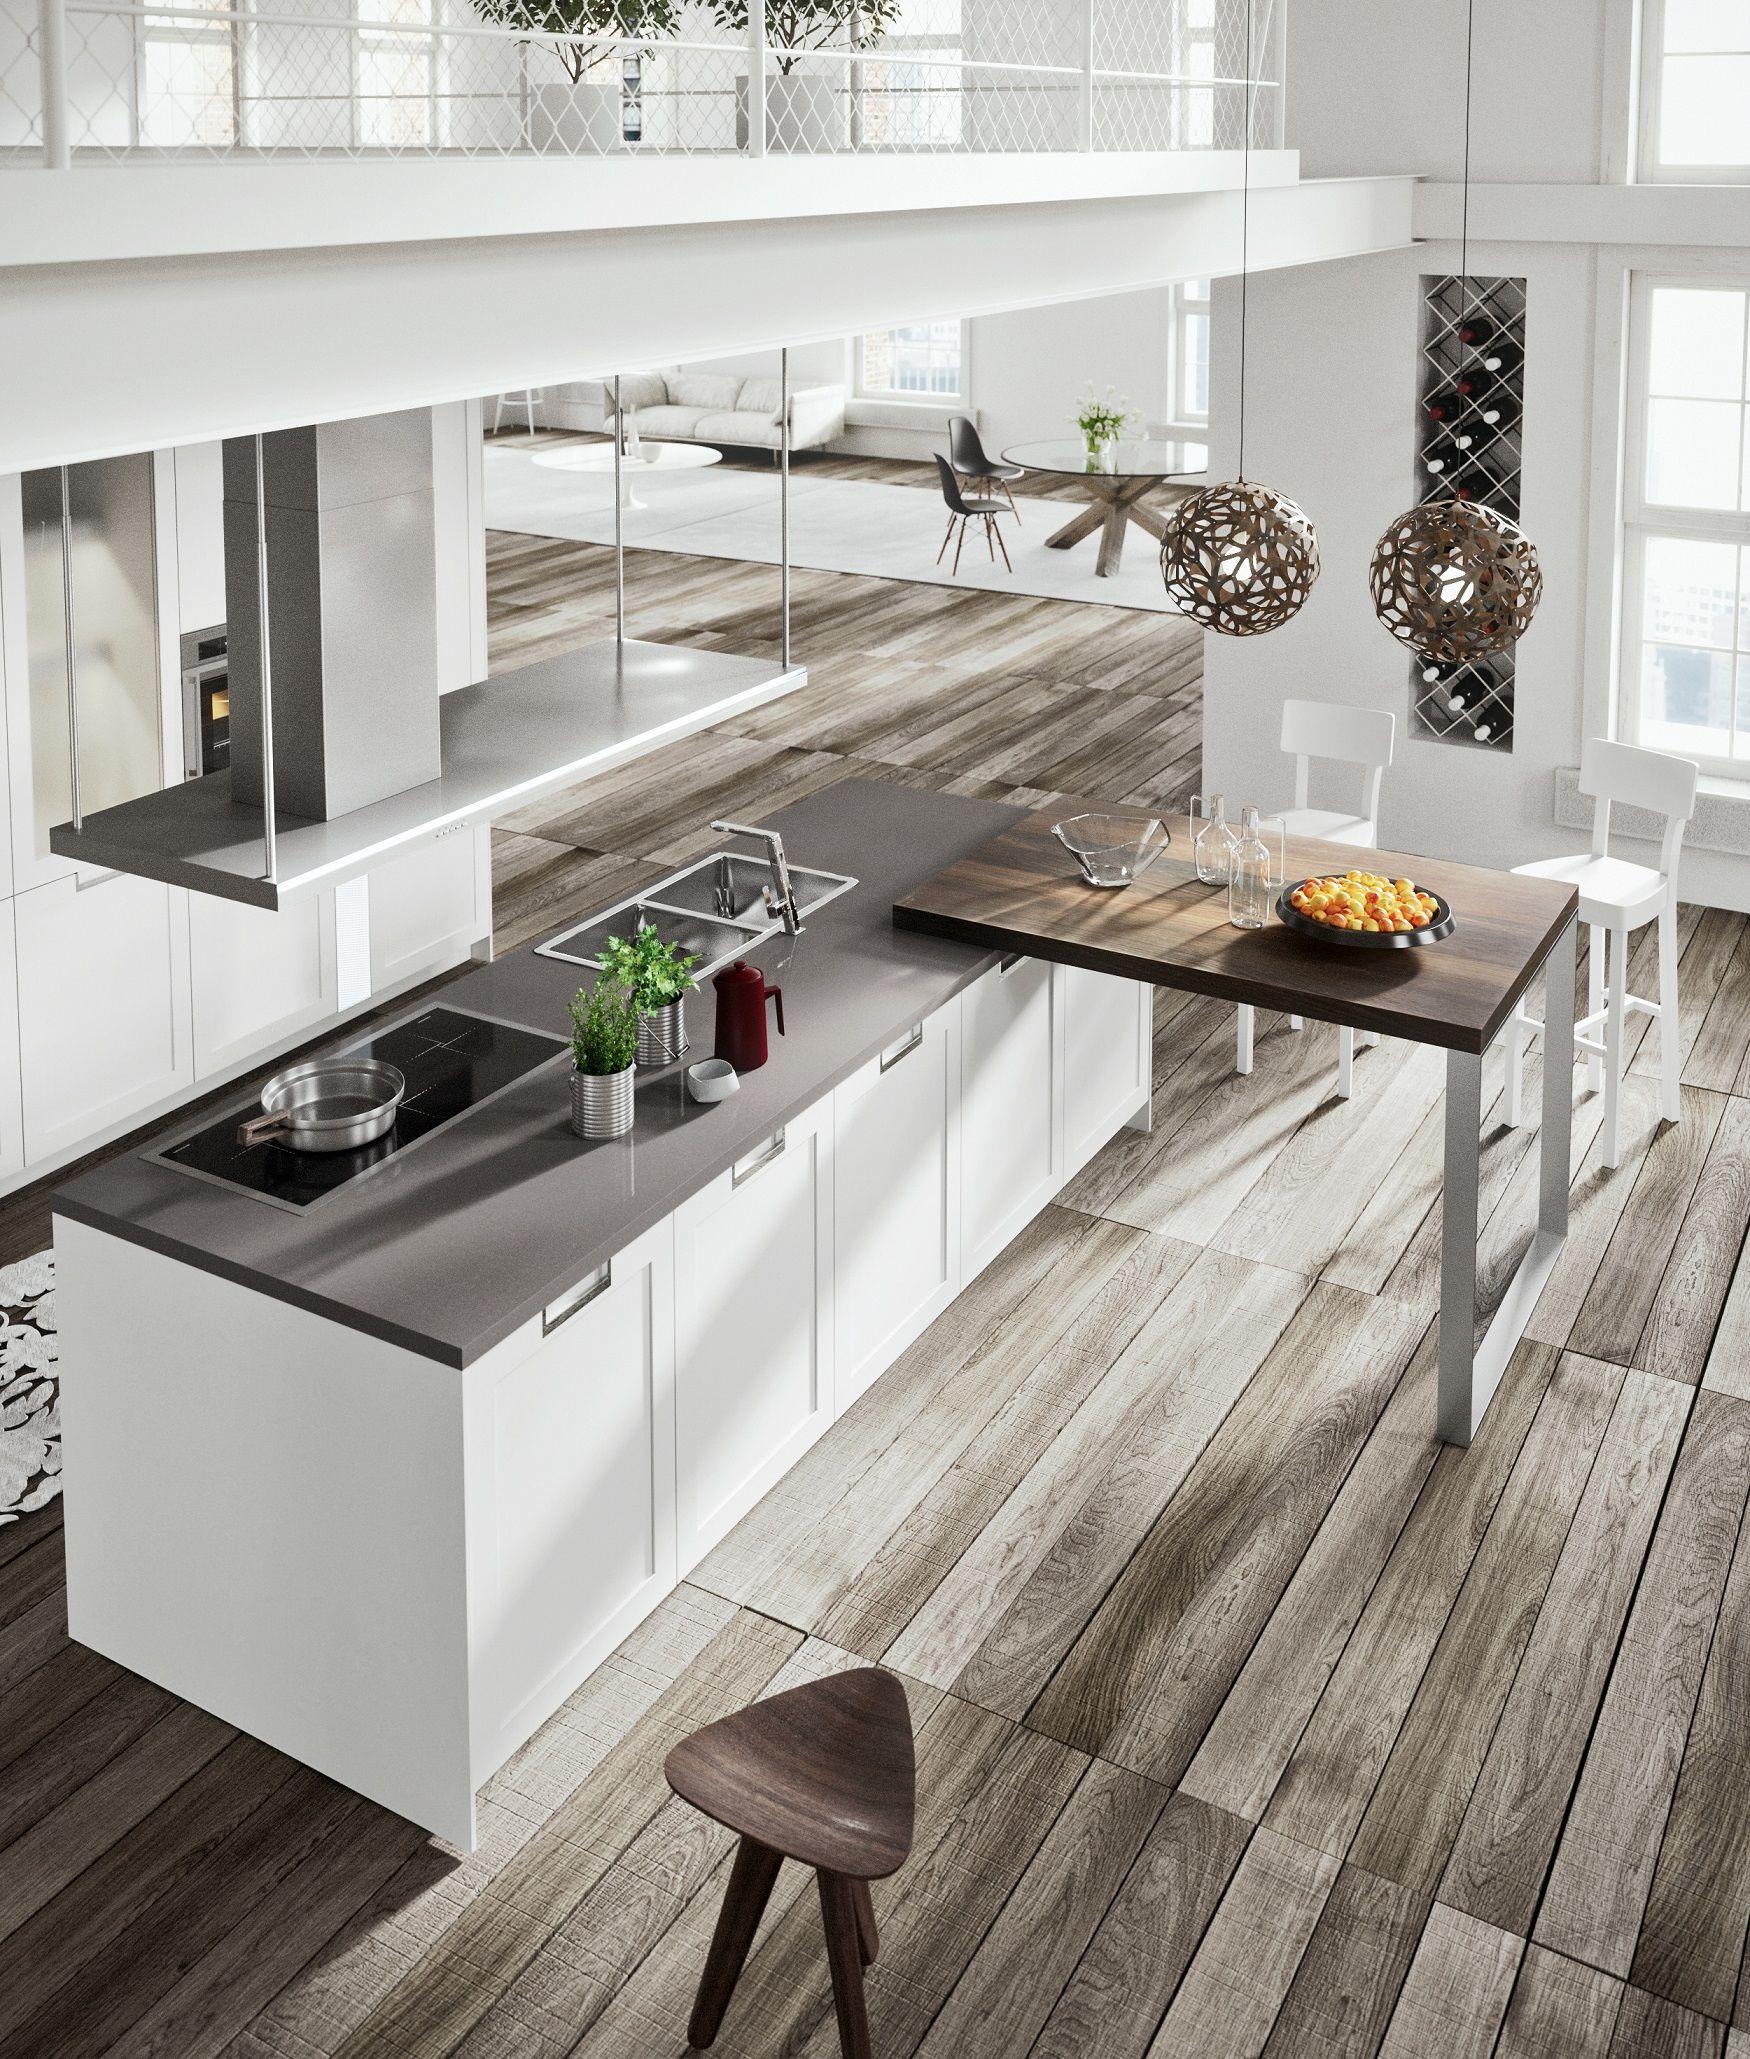 White transitional kitchen by Snaidero Snaidero USA